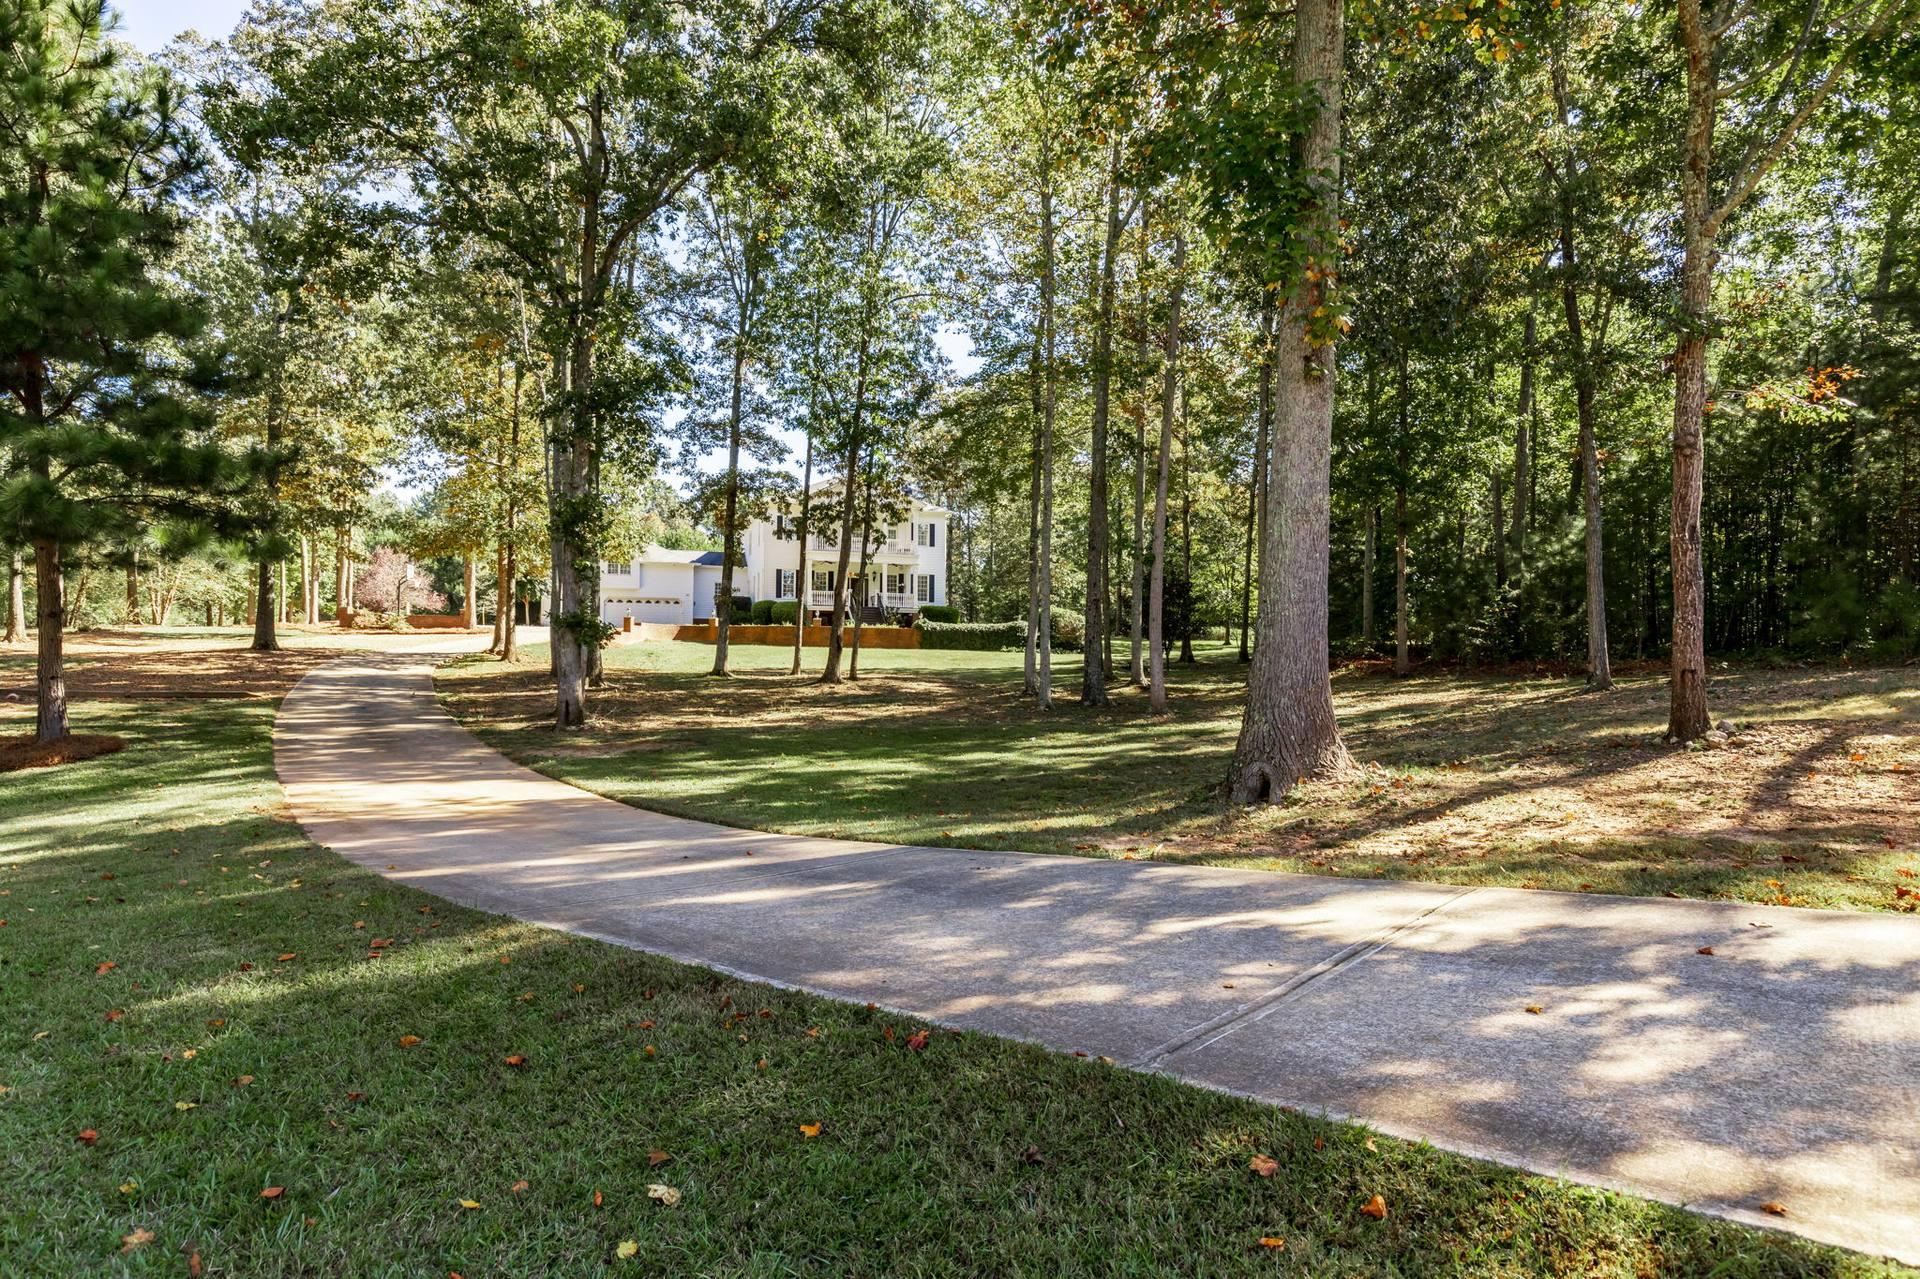 5370 Hopgood Rd, Acworth, GA 30102, US